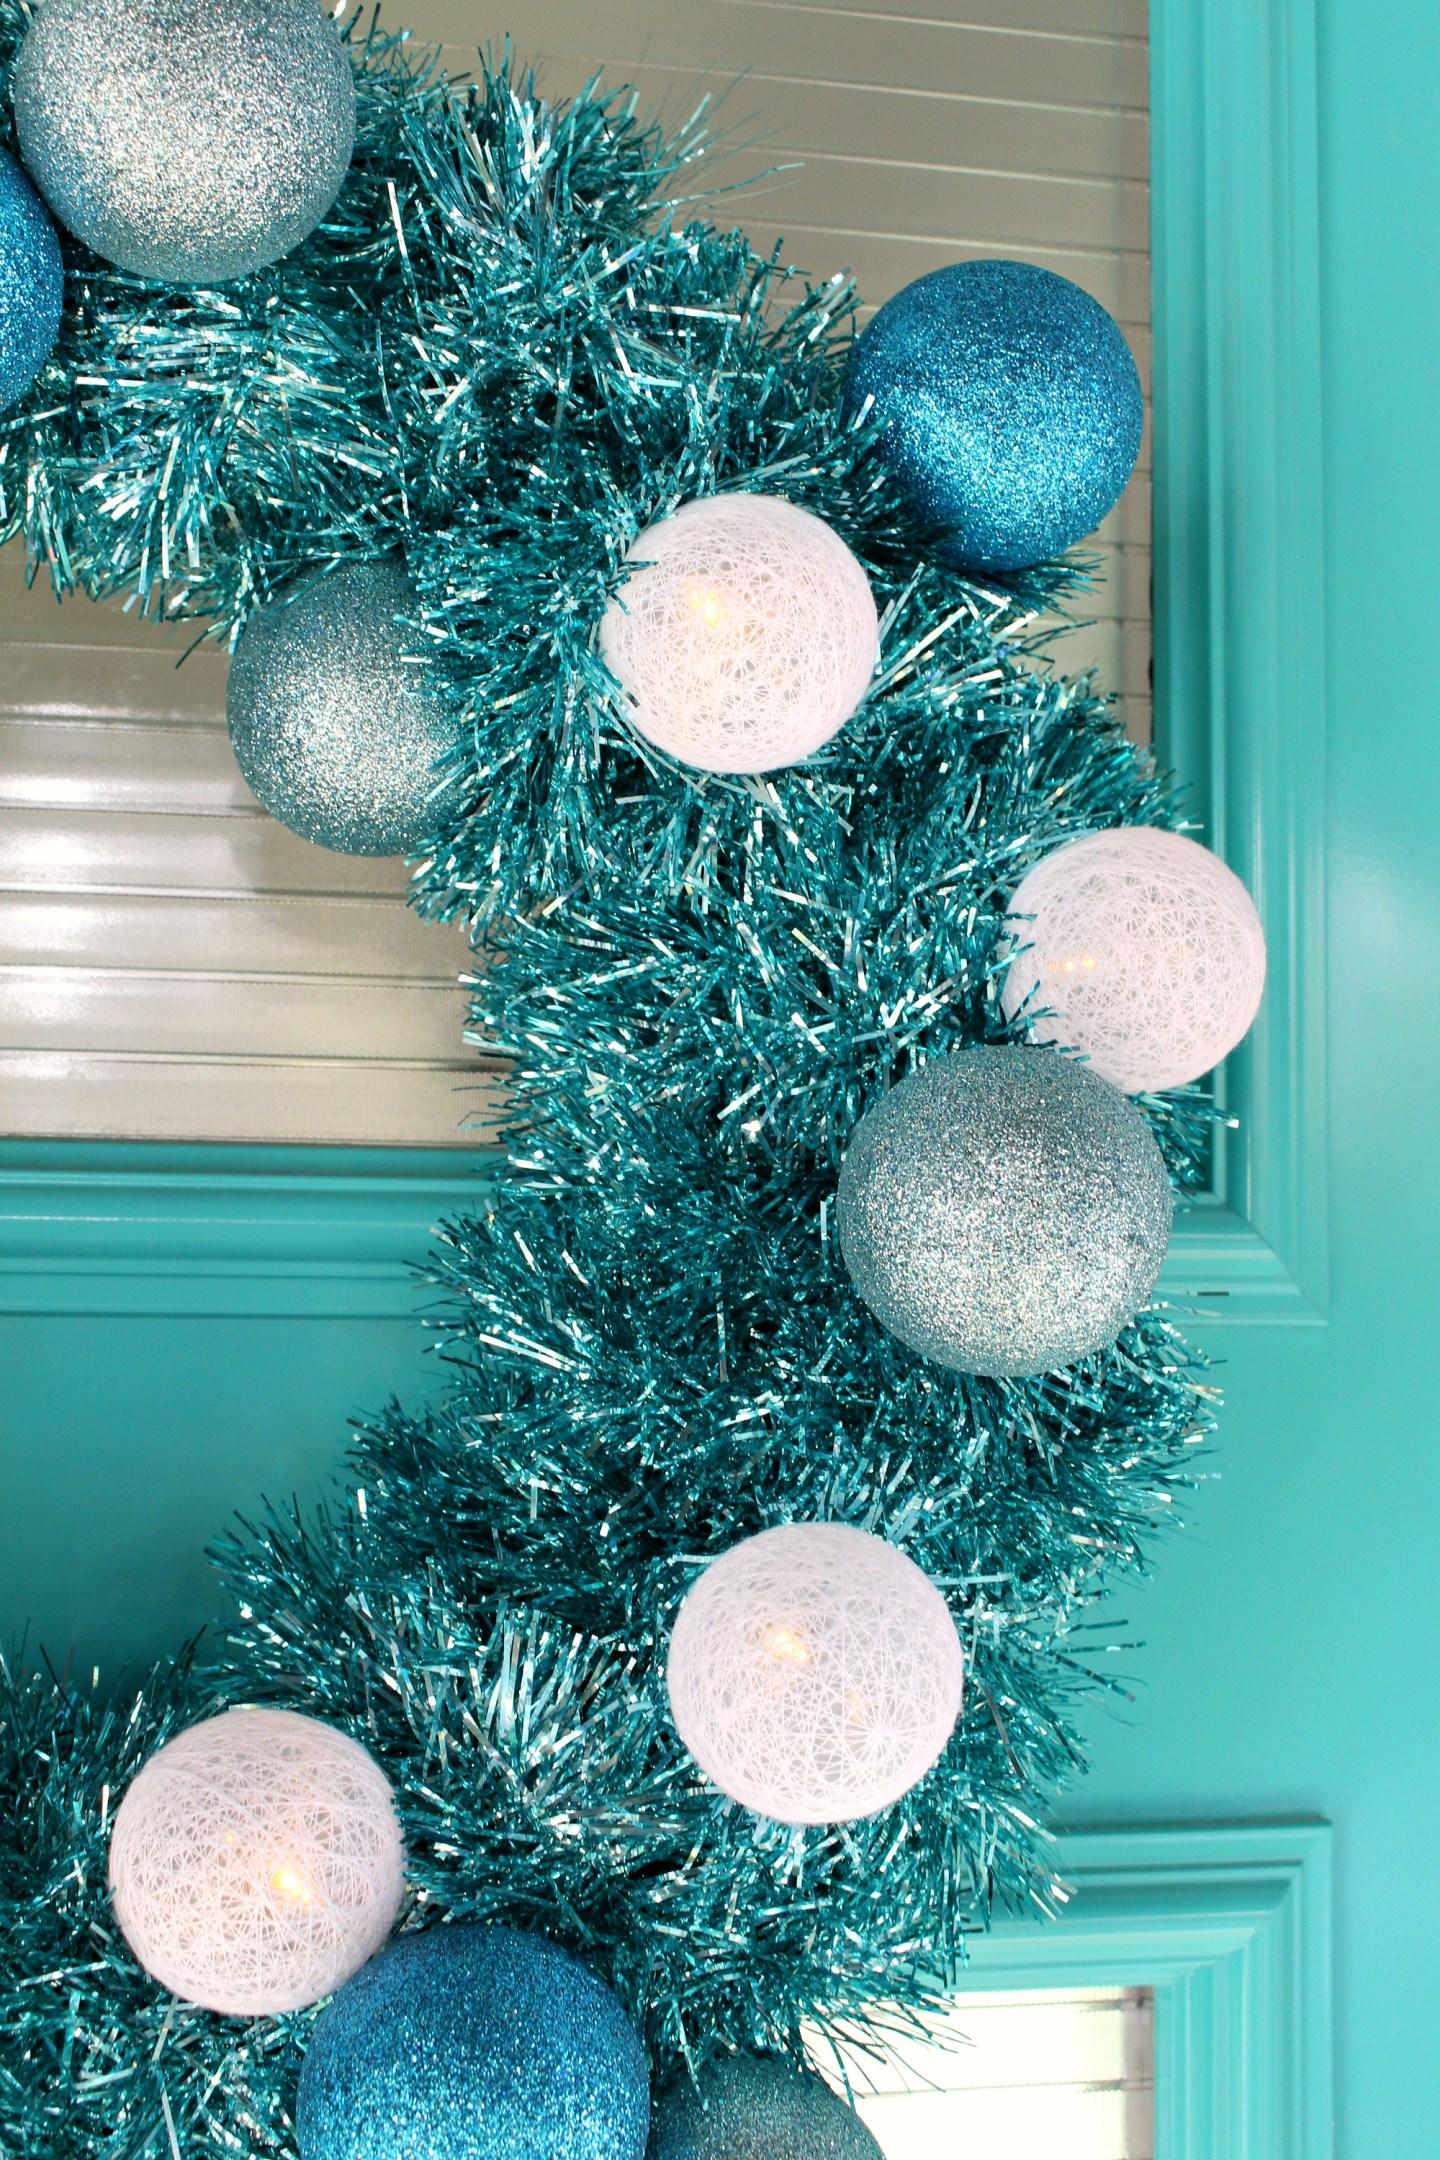 Aqua DIY Tinsel Wreath with Retro Vibes #diychristmas #tinsel #tinselwreath #retrochristmas